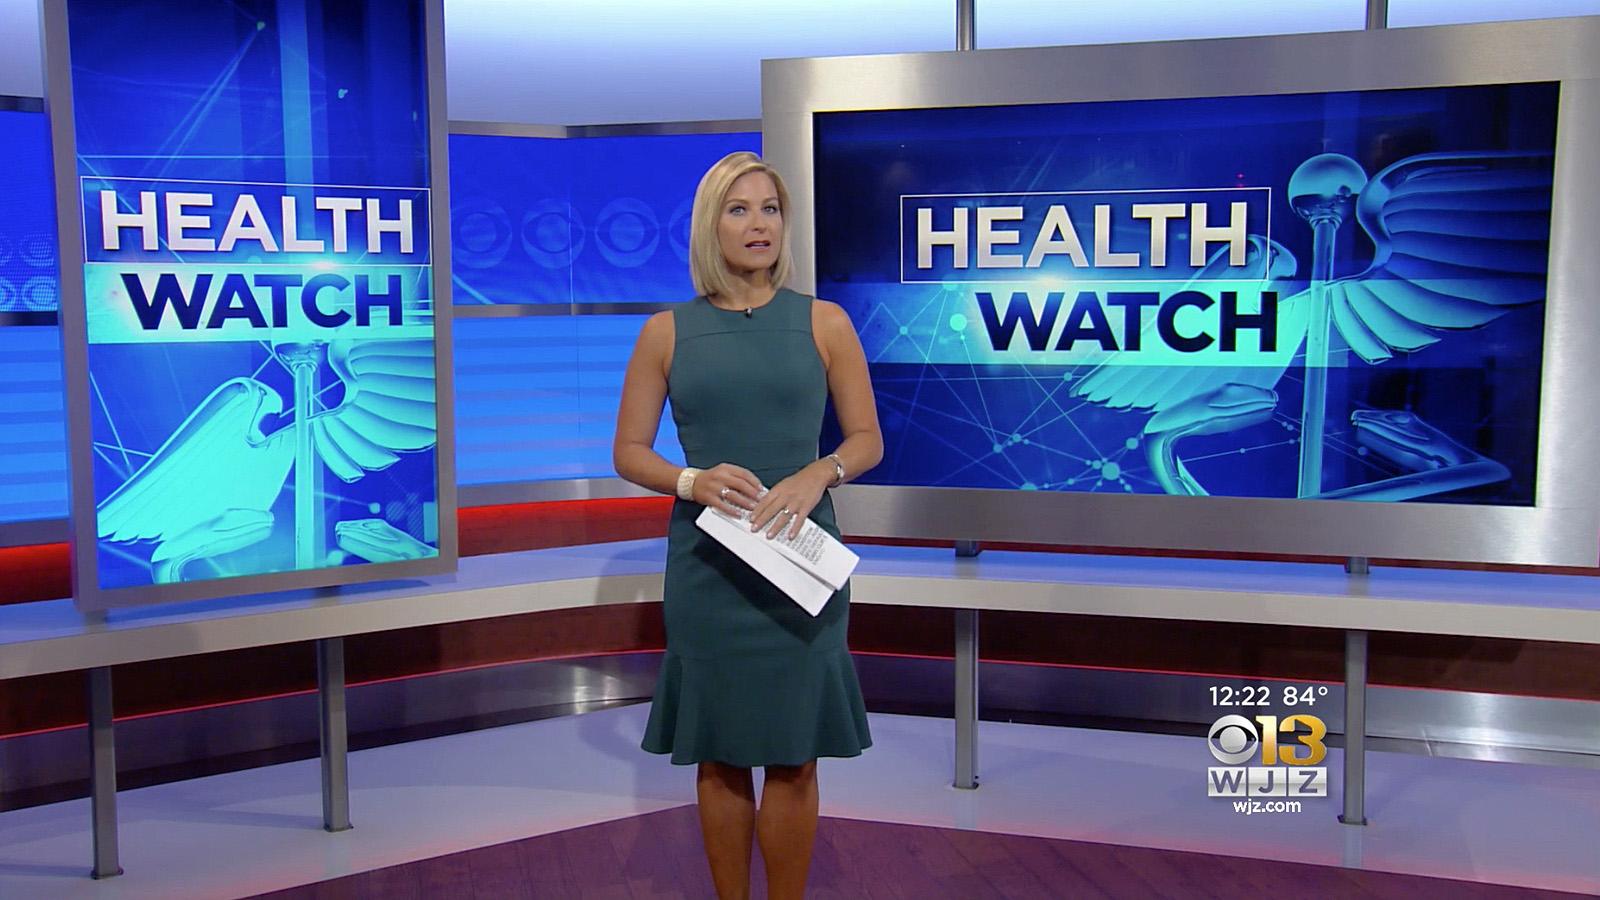 ncs_WJZ-CBS-13-Baltimore-TV-Studio_0004